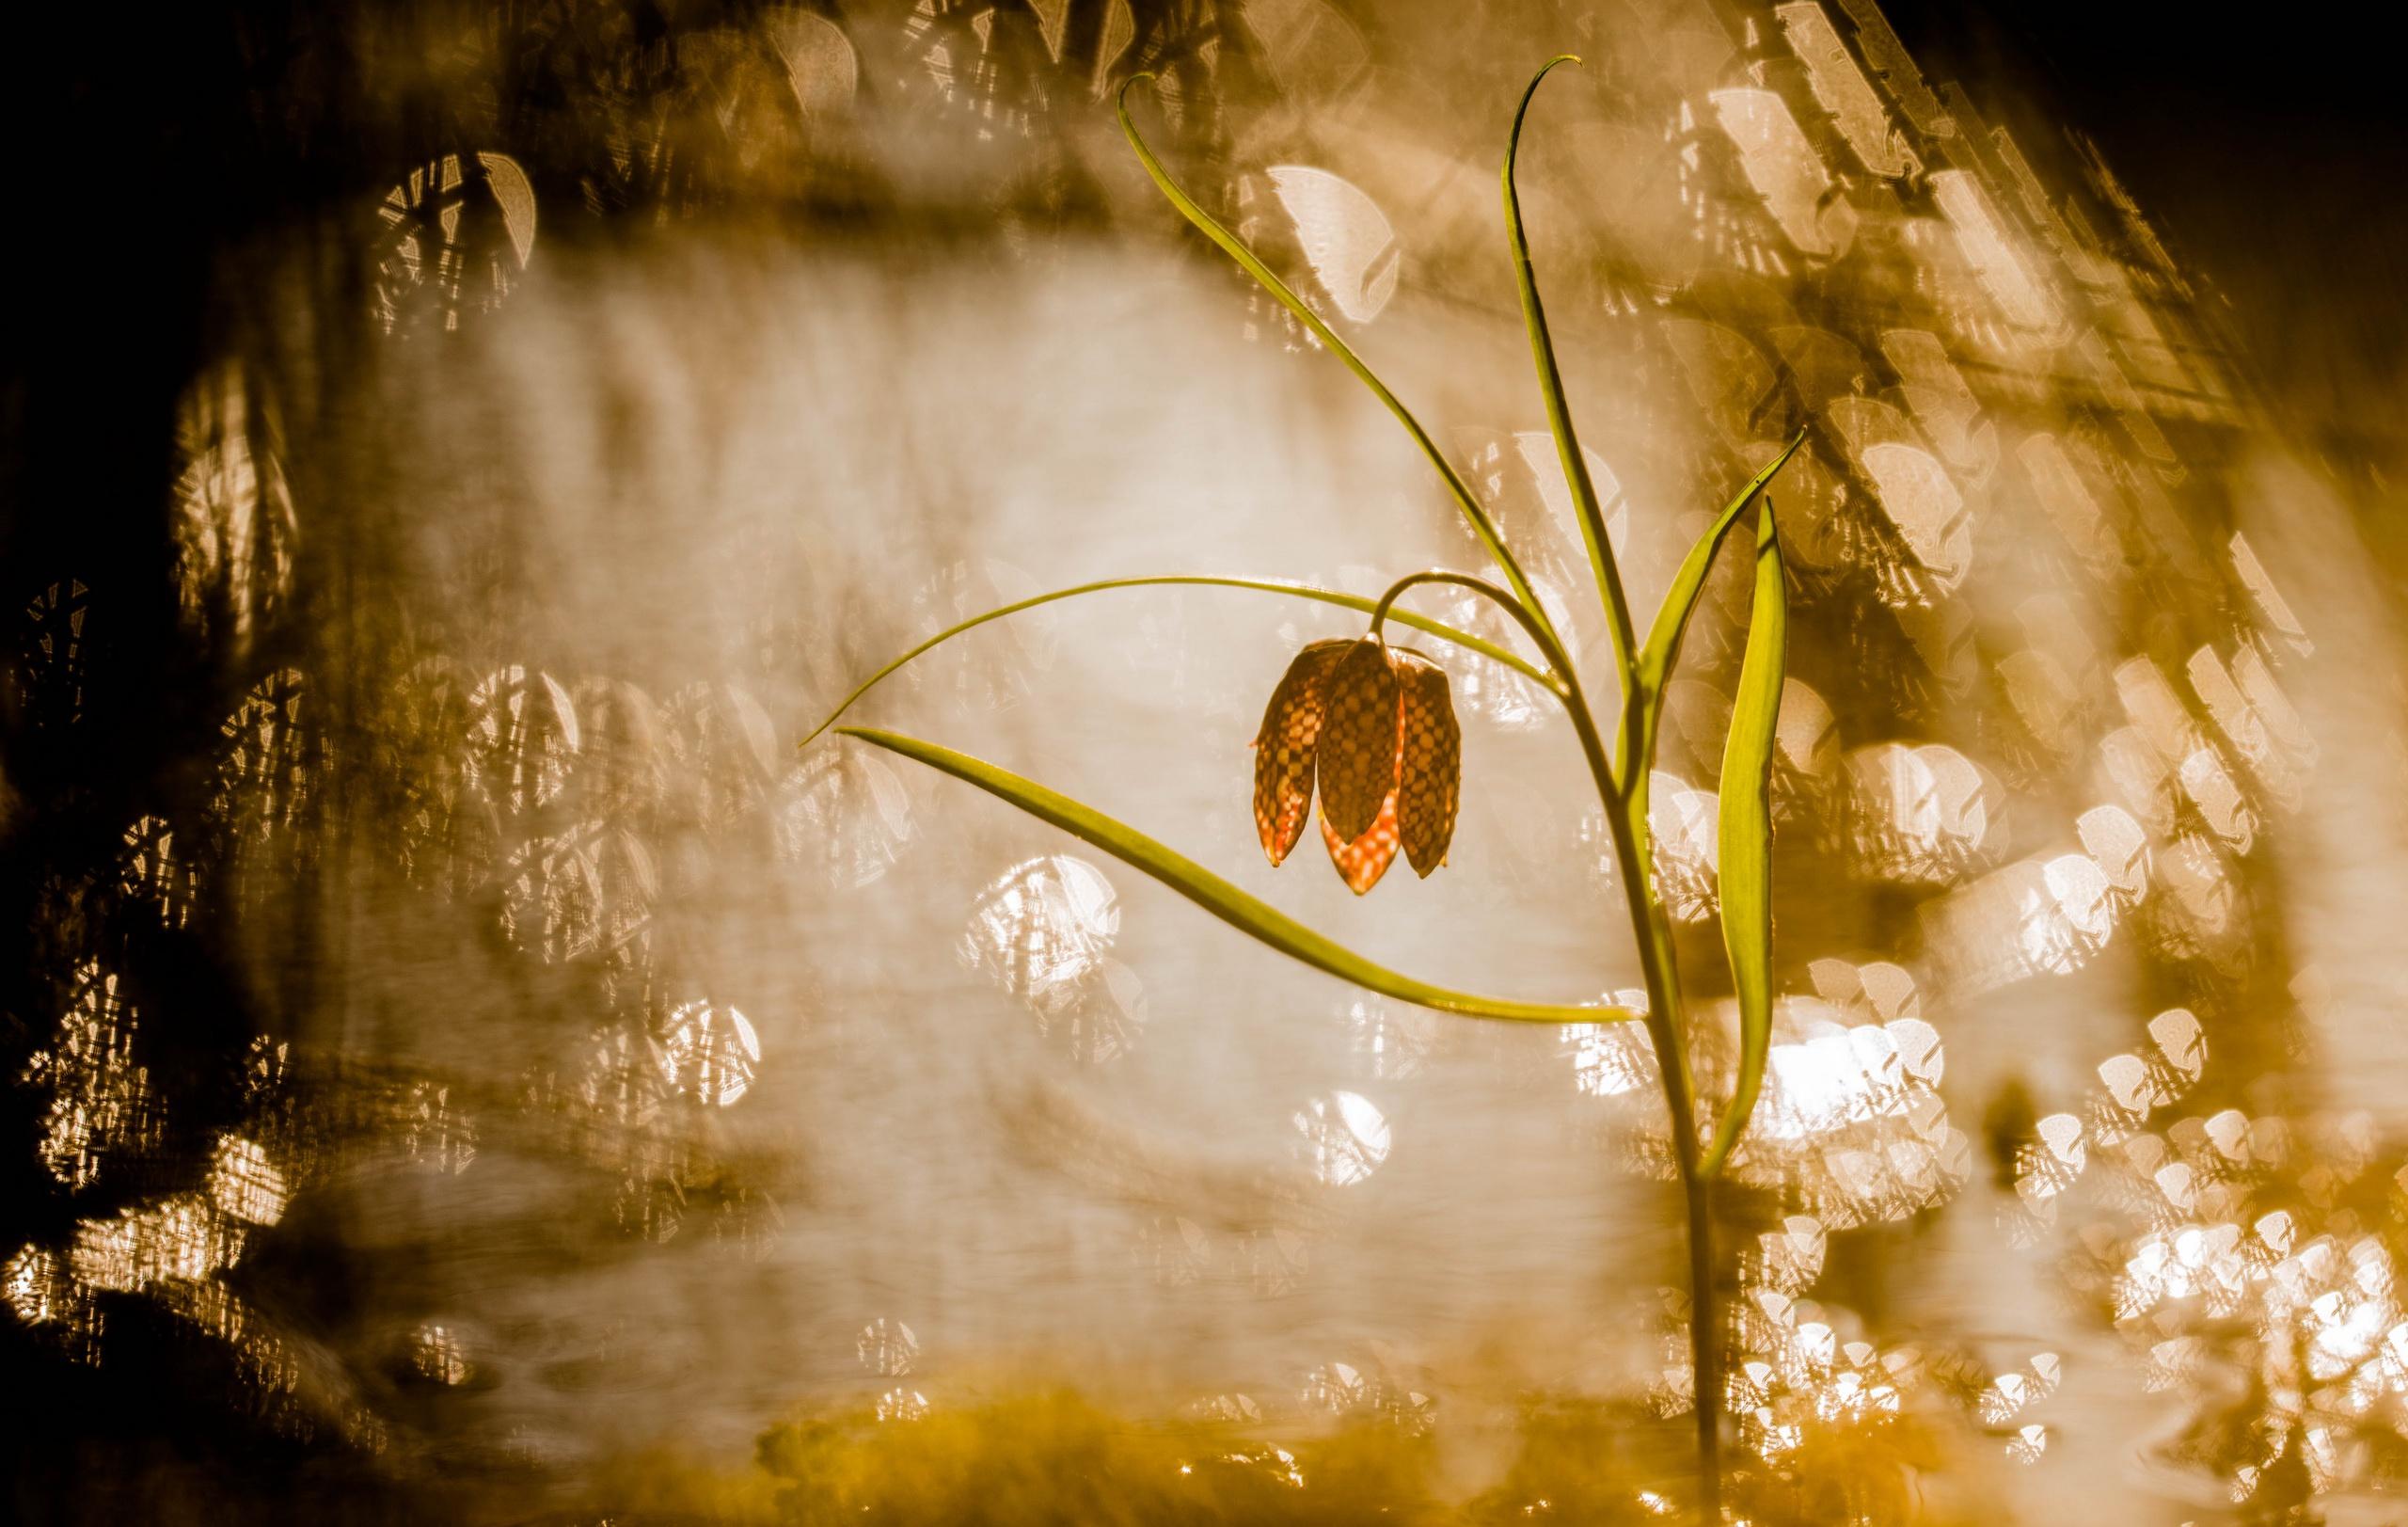 Bokeh Close Up Flower Nature 2560x1623